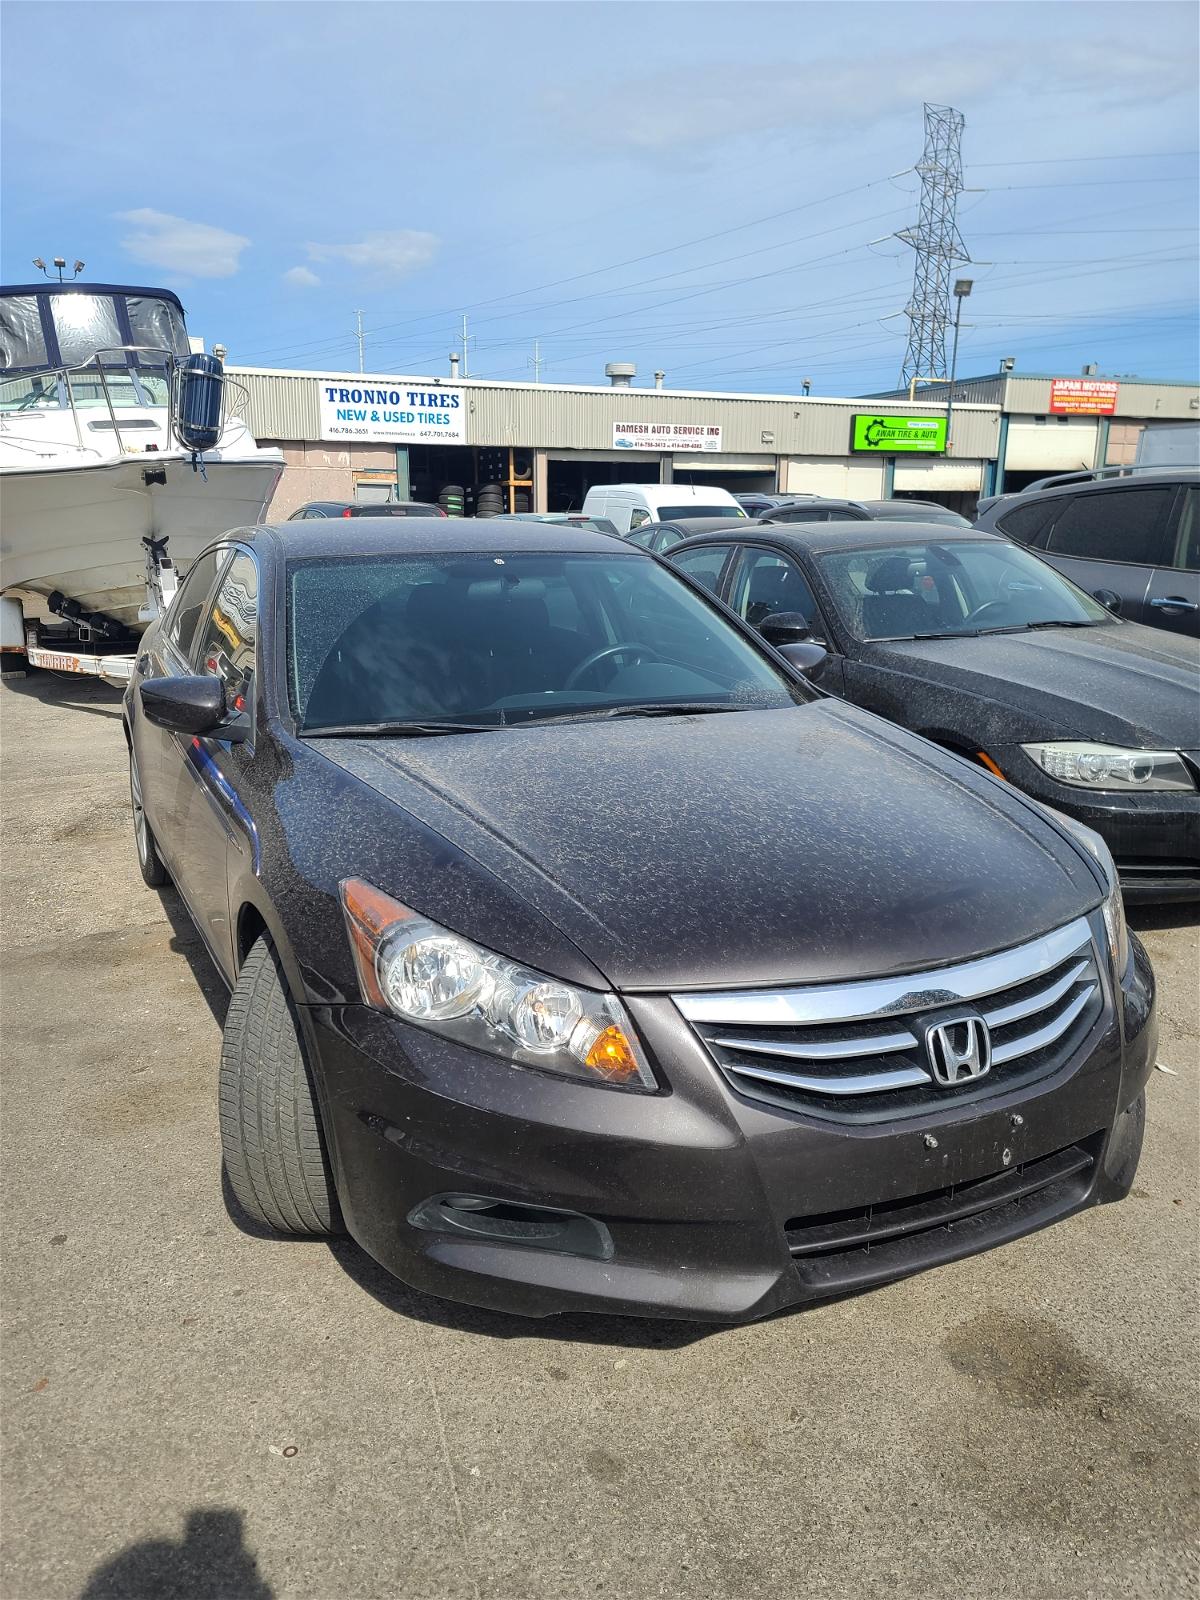 2011 - Honda - Accord - 1HGCP2F69BA802366